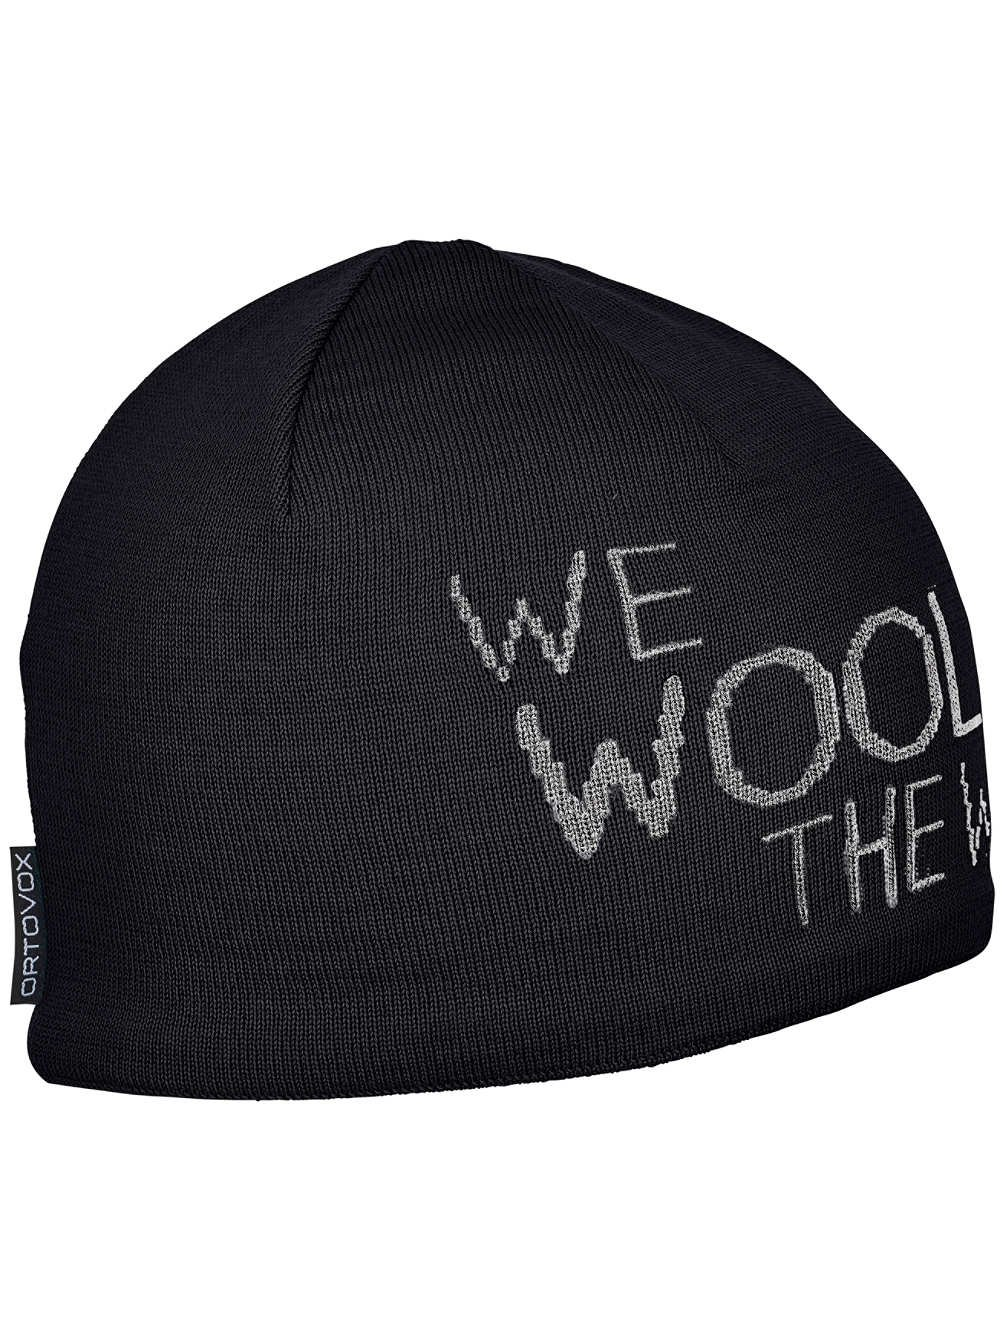 Ortovox We Wool The World Beanie, Black Raven, 50 – 56 cm 50 - 56 cm 6800100001